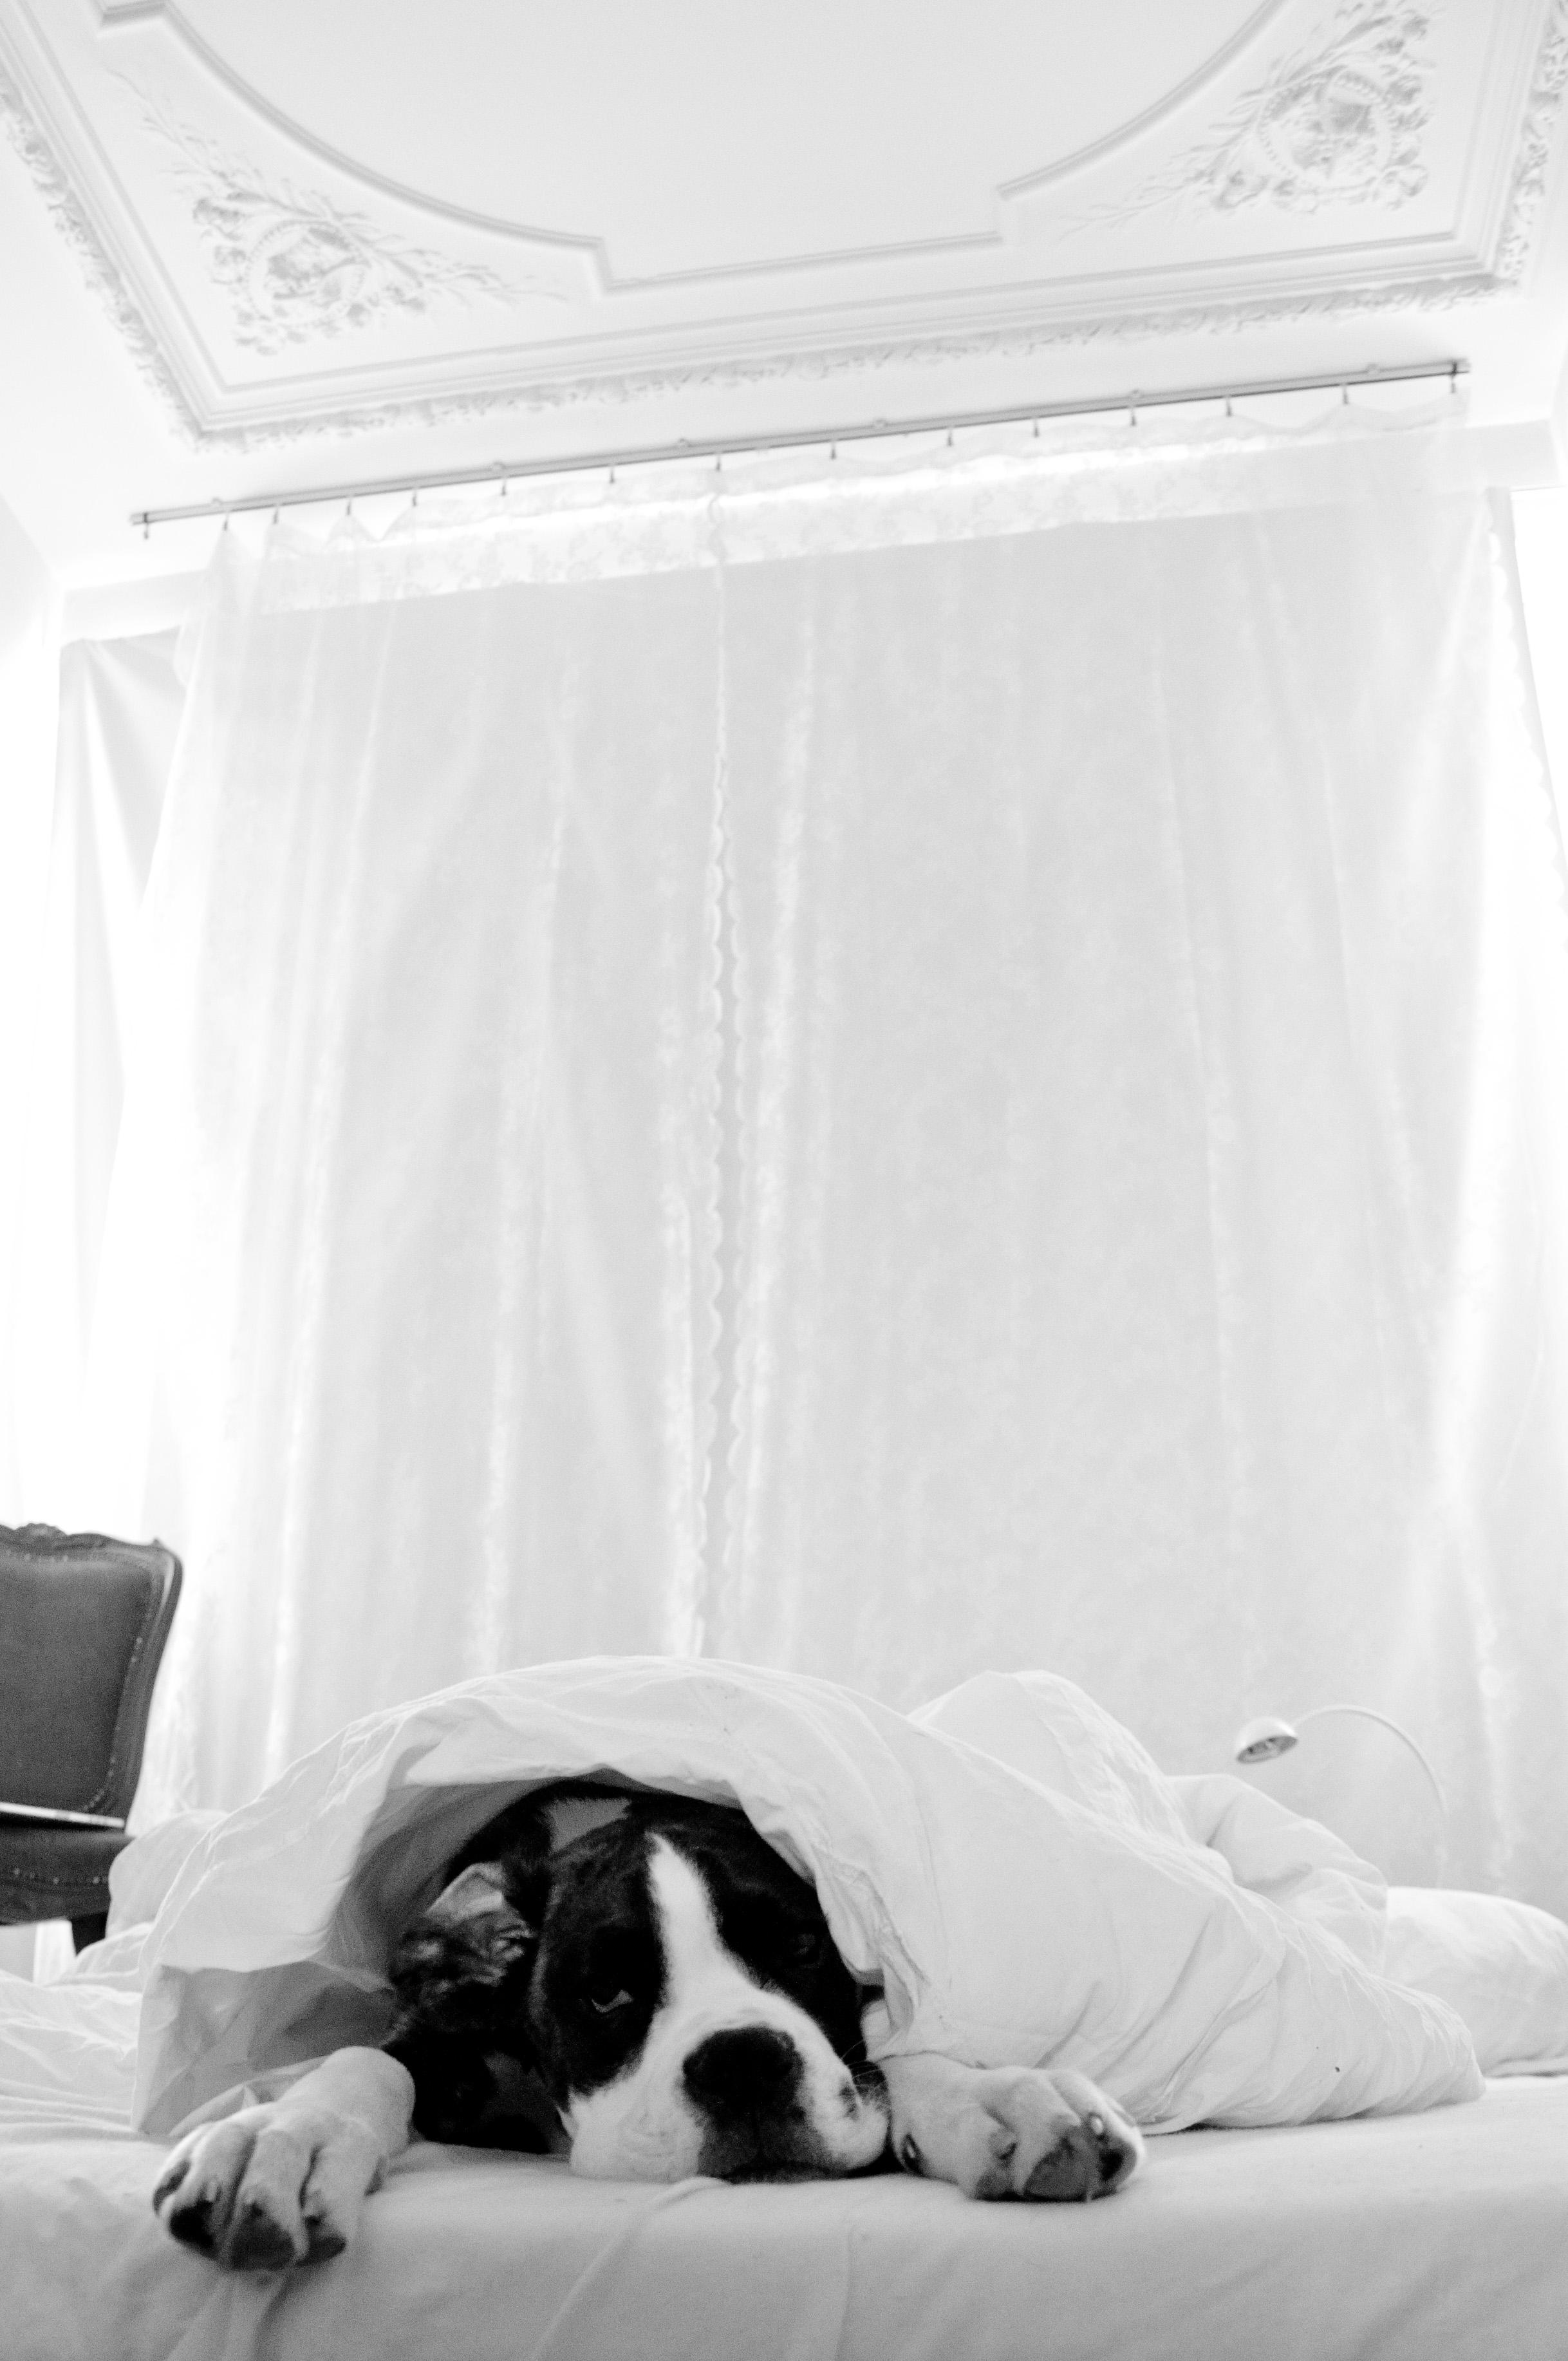 Dog sleeping in bed, Animal, Lazy, Tired, Sleeping, HQ Photo